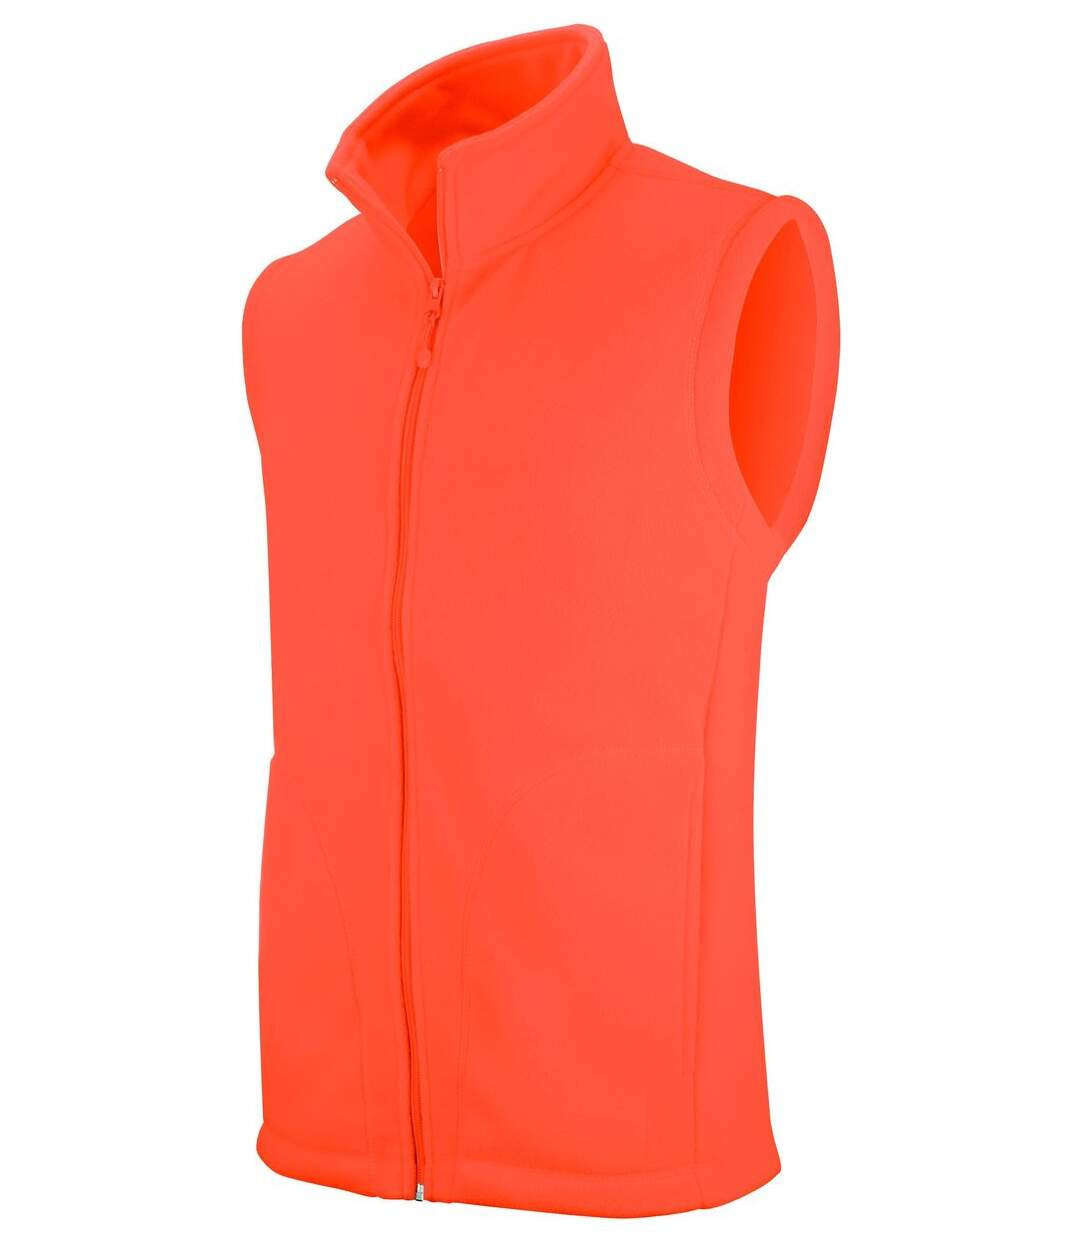 Gilet sans manches micro polaire homme - K913 - orange fluo